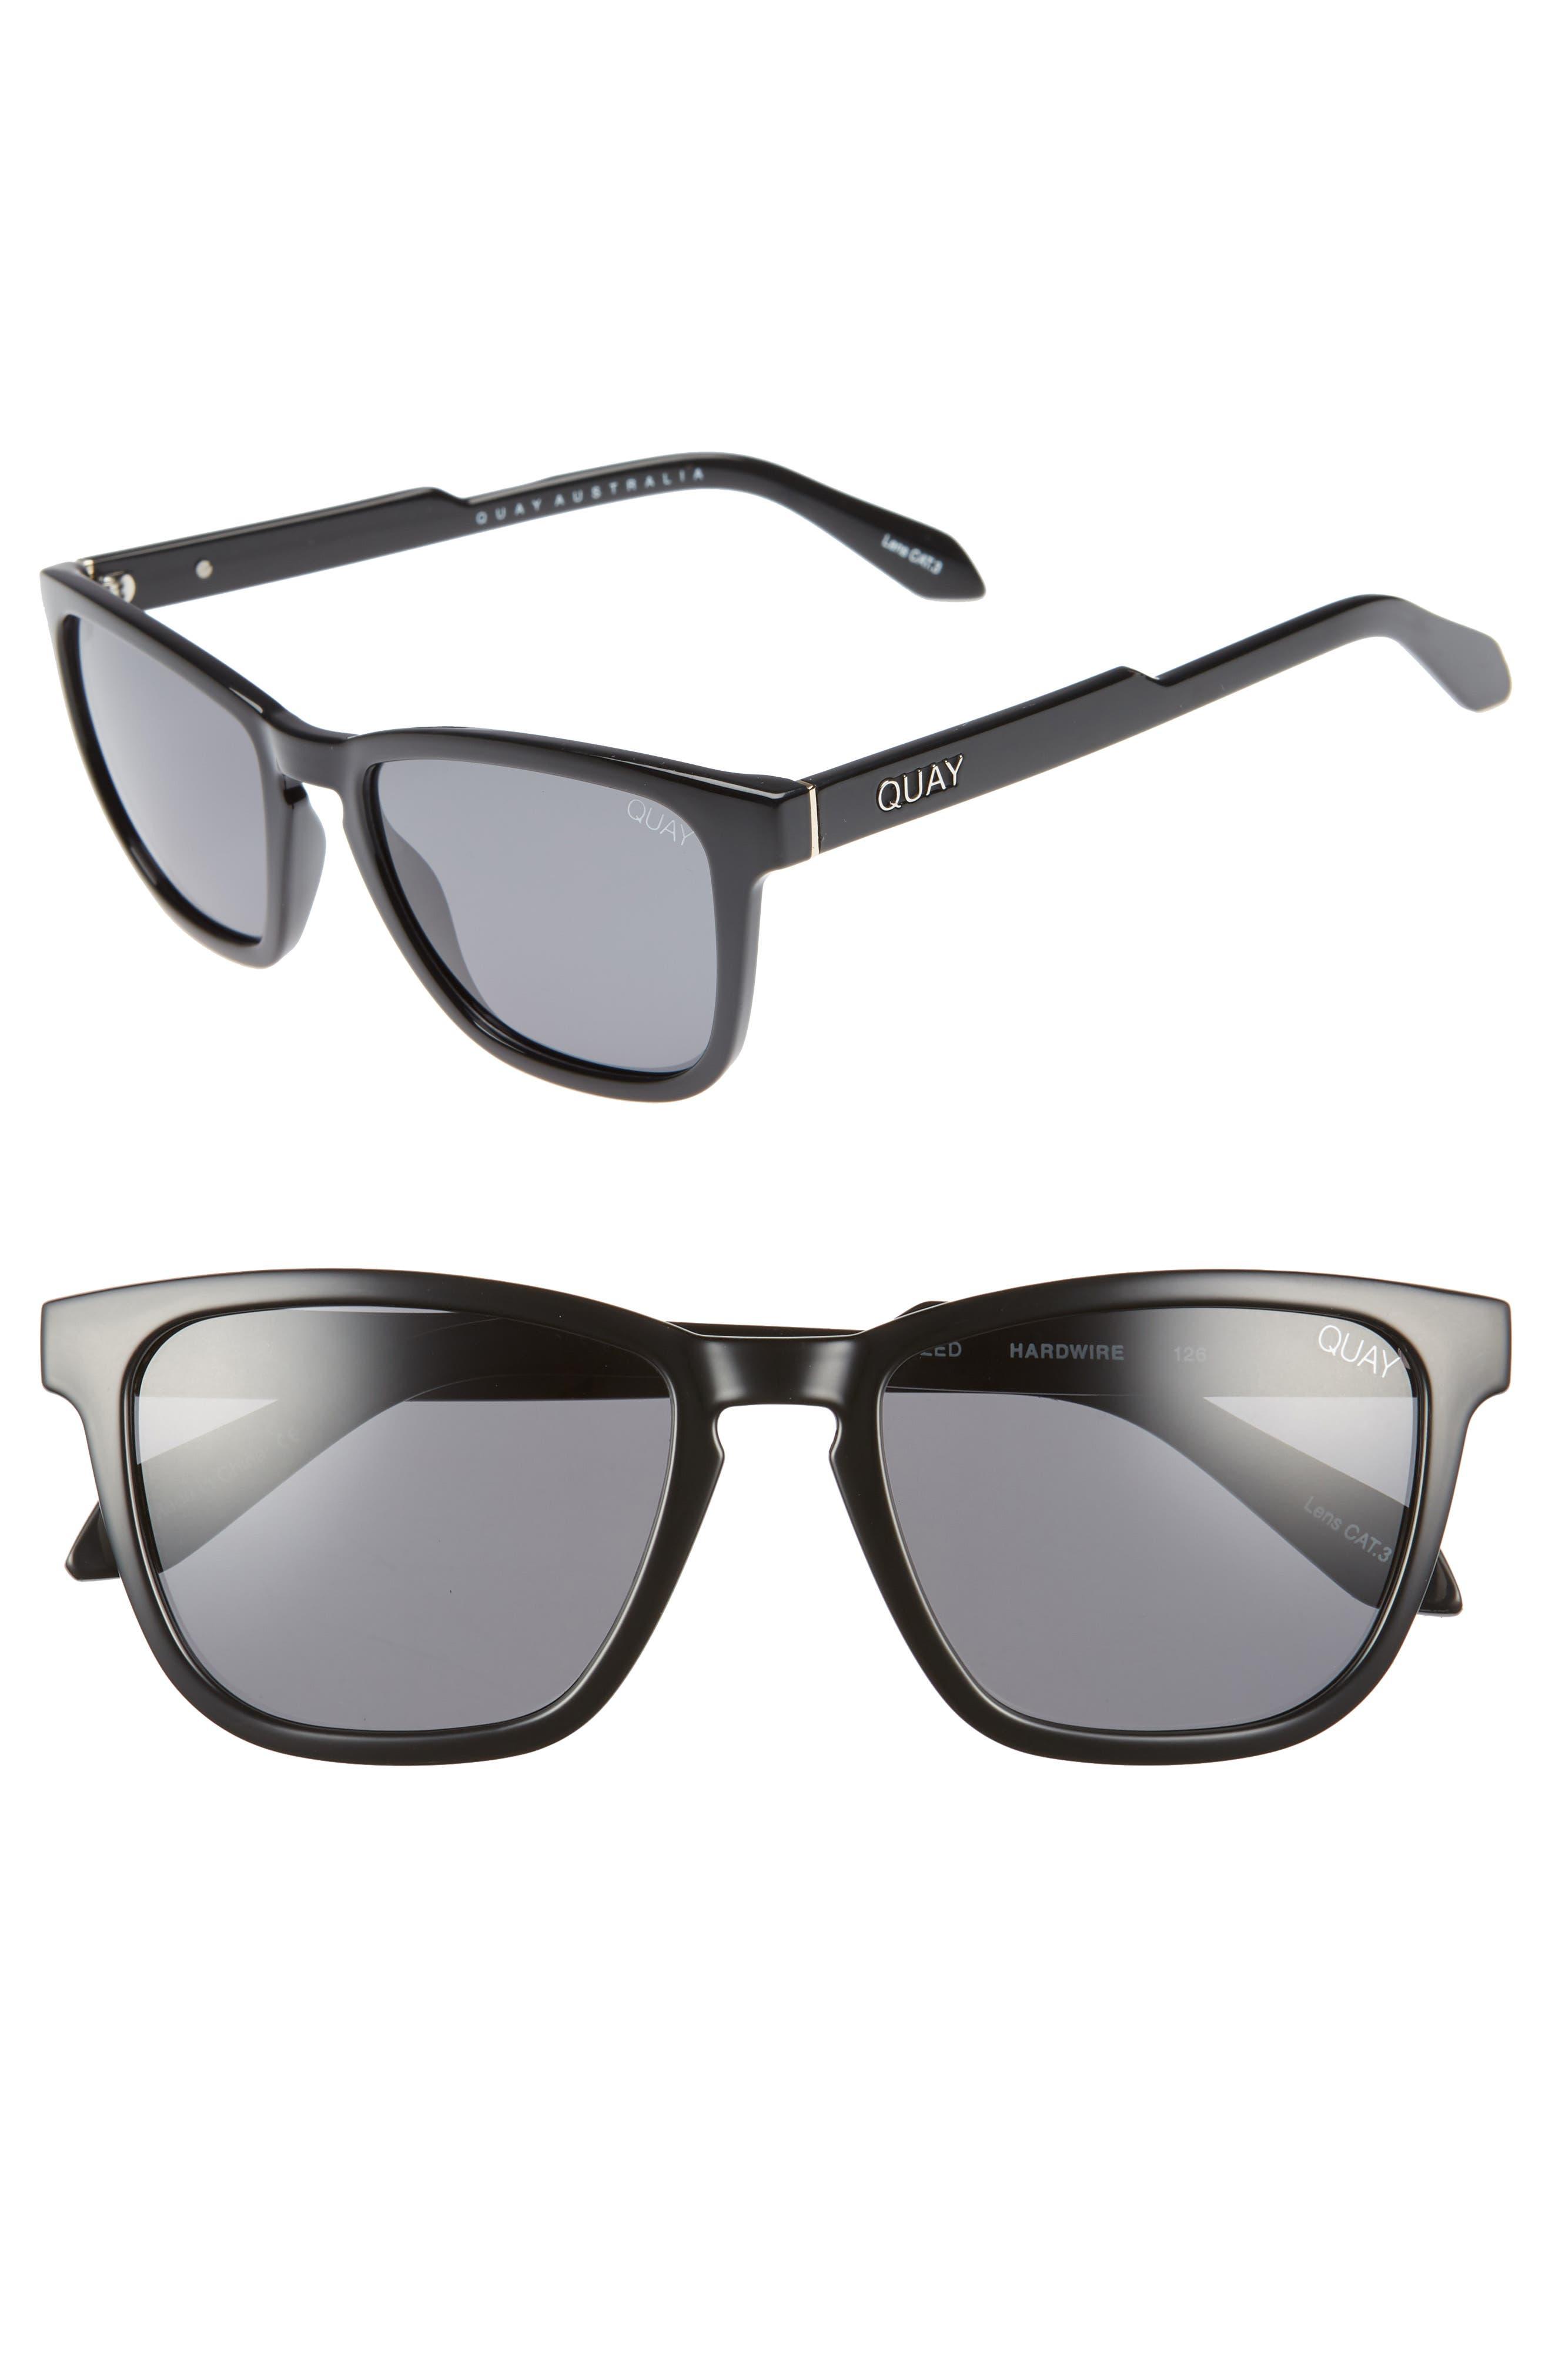 Hardwire 54mm Polarized Sunglasses,                             Main thumbnail 1, color,                             BLACK/ SMOKE LENS